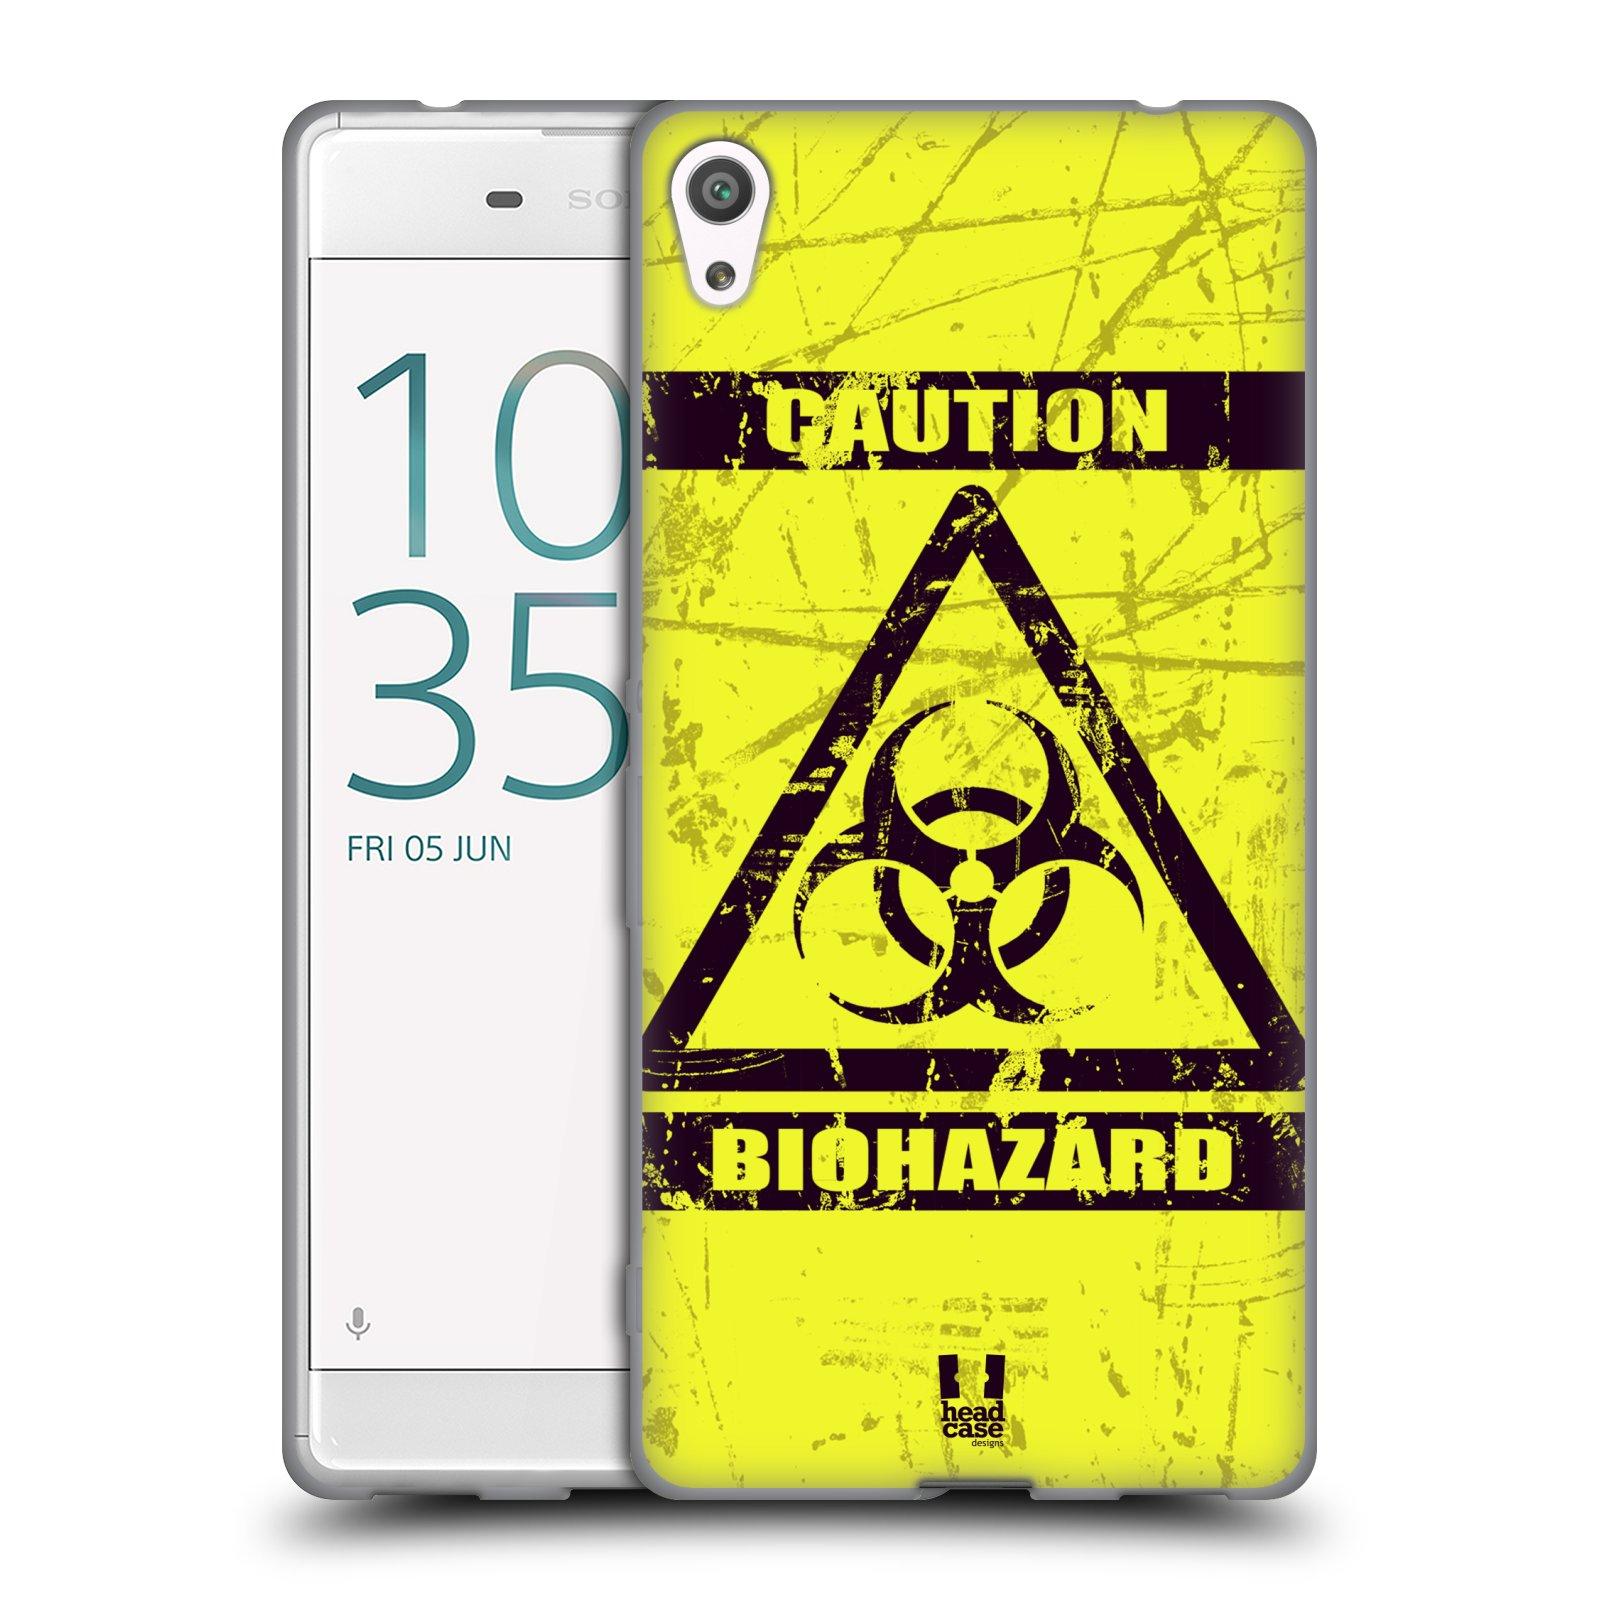 Silikonové pouzdro na mobil Sony Xperia XA Ultra HEAD CASE BIOHAZARD